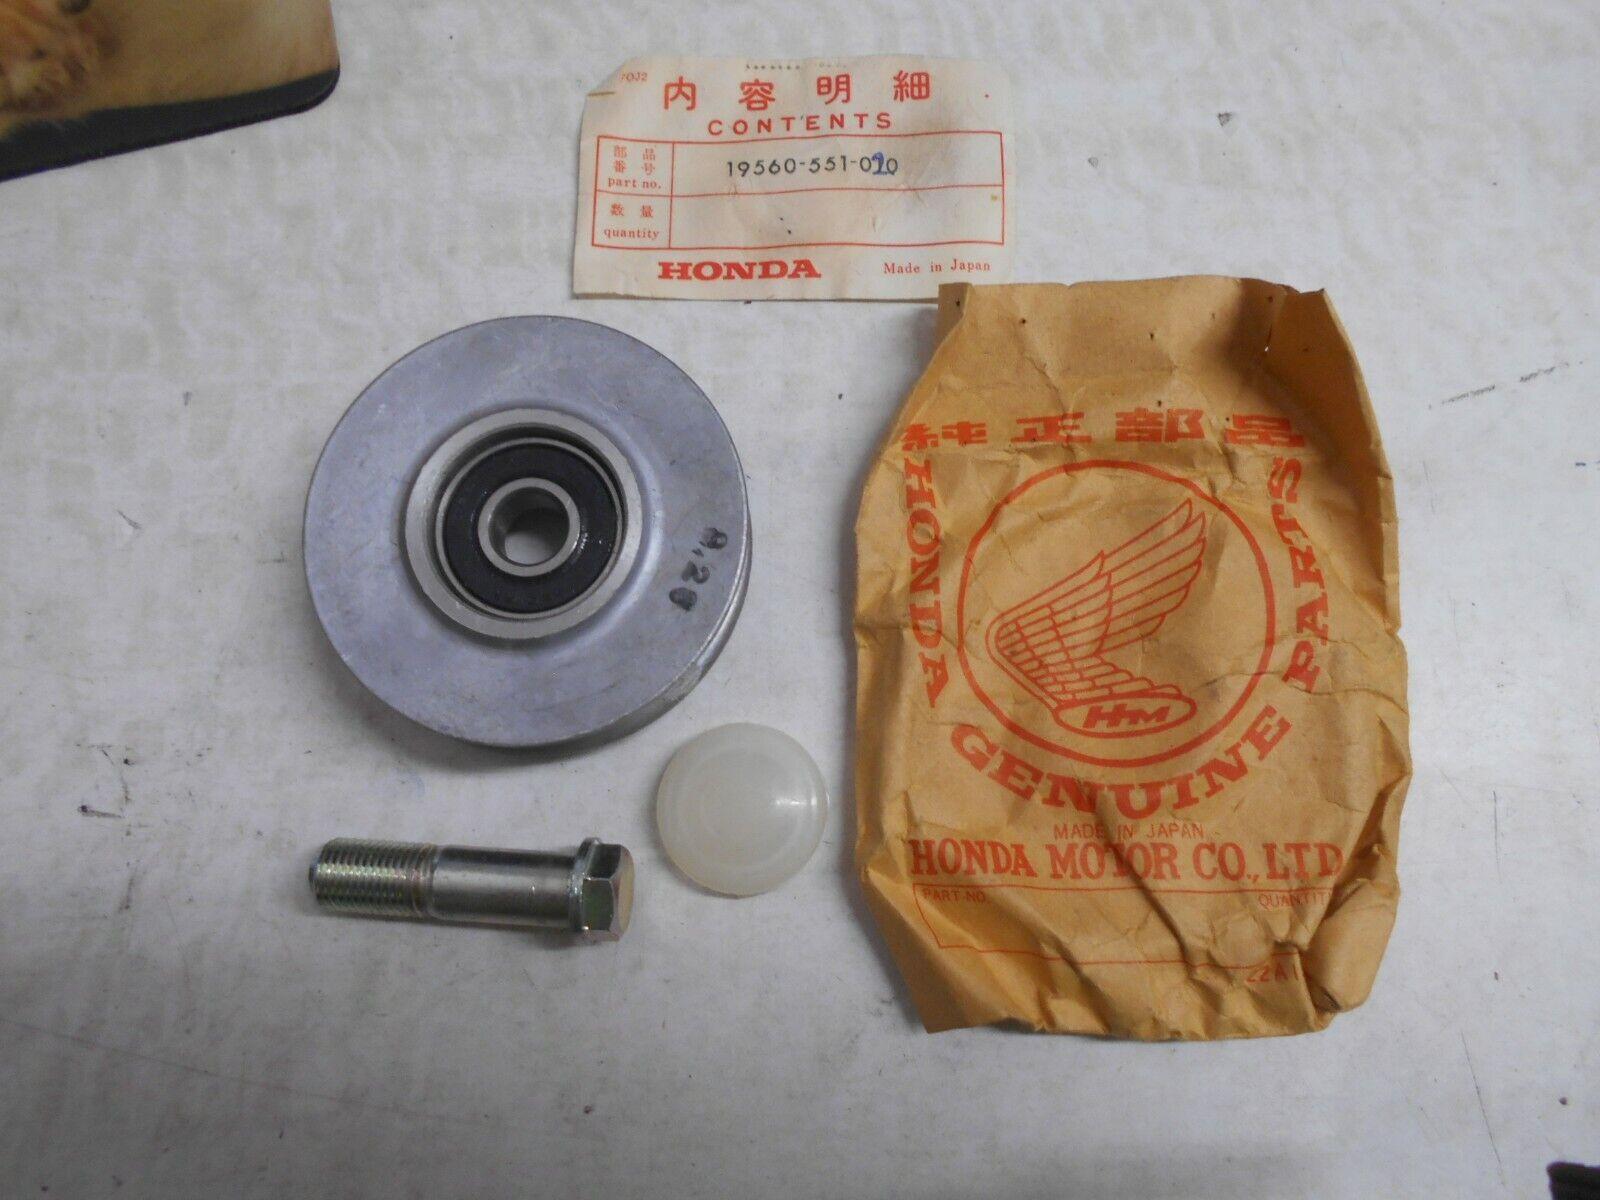 Car Parts - GENUINE HONDA CAR PARTS PULLEY SET A360 A600 LN360 N360 N600 19560-551-010